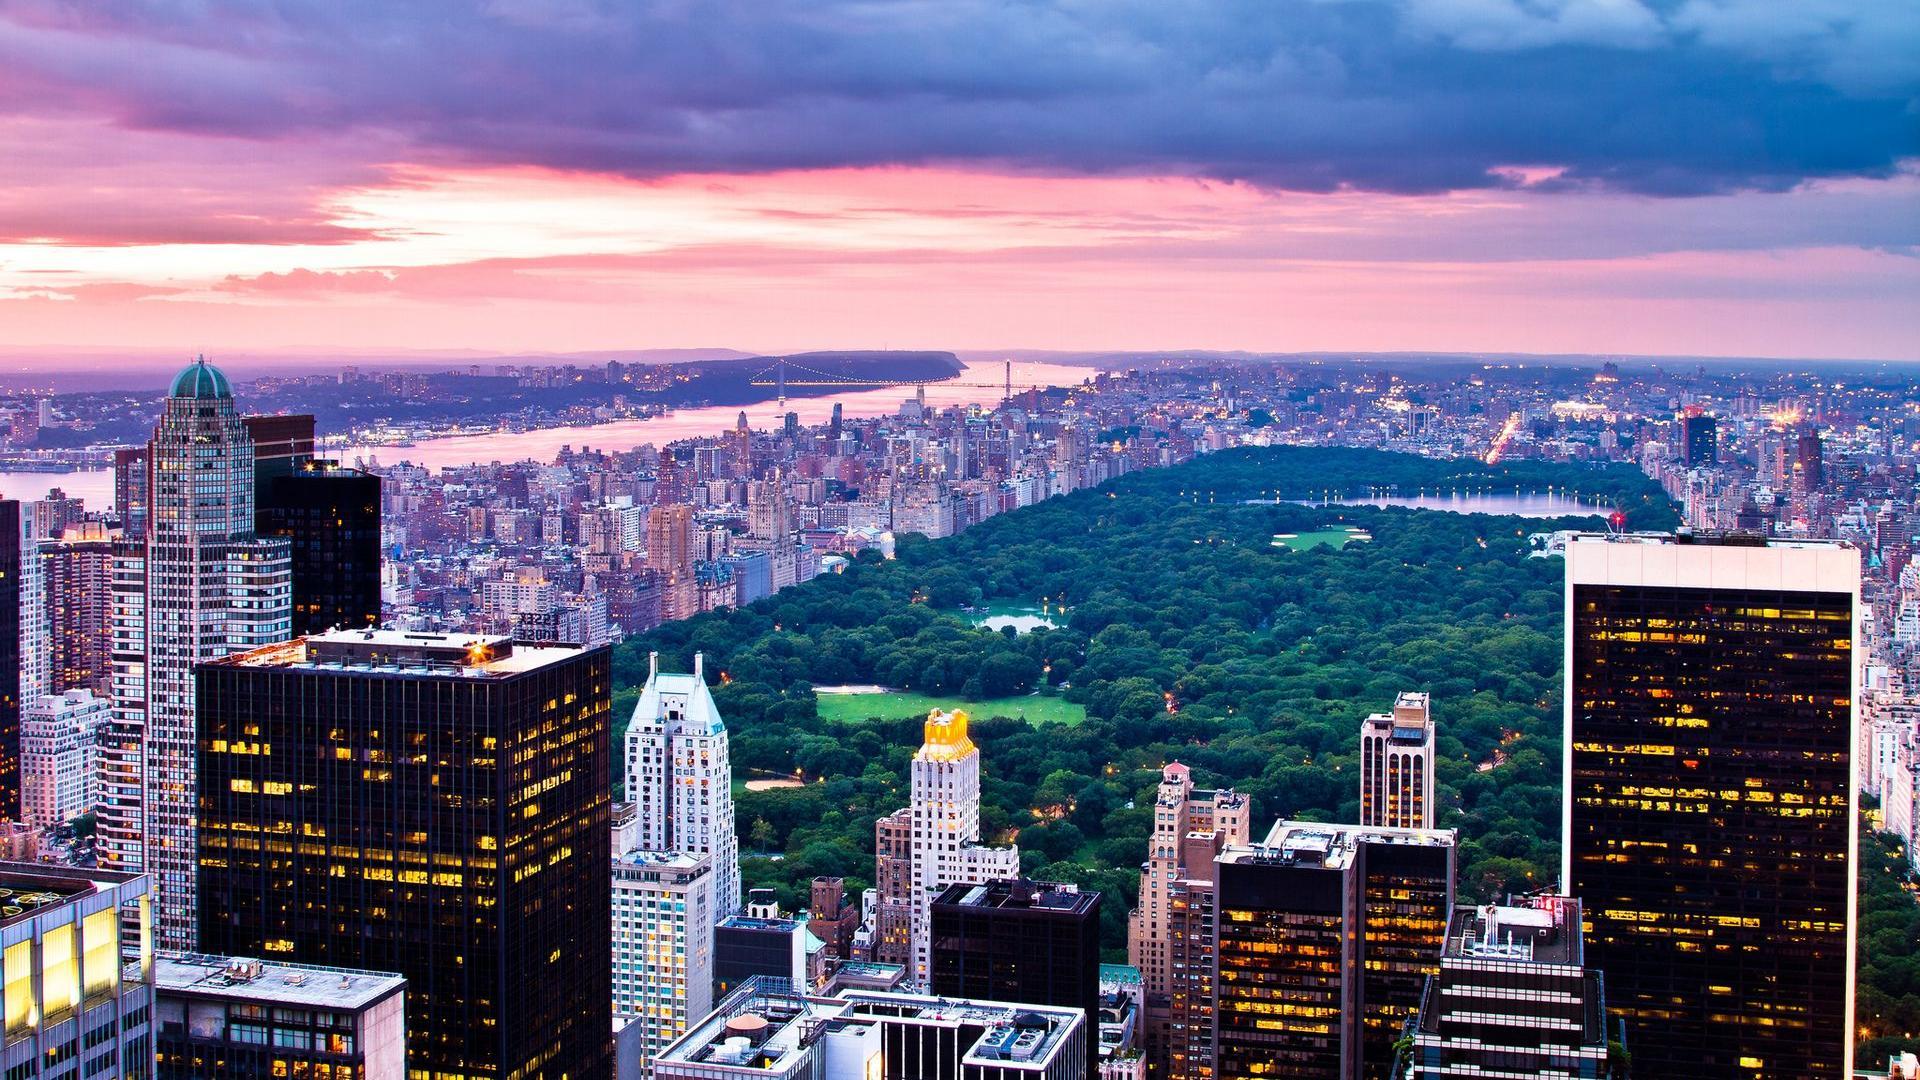 New York City Images Wallpaper Sf Wallpaper